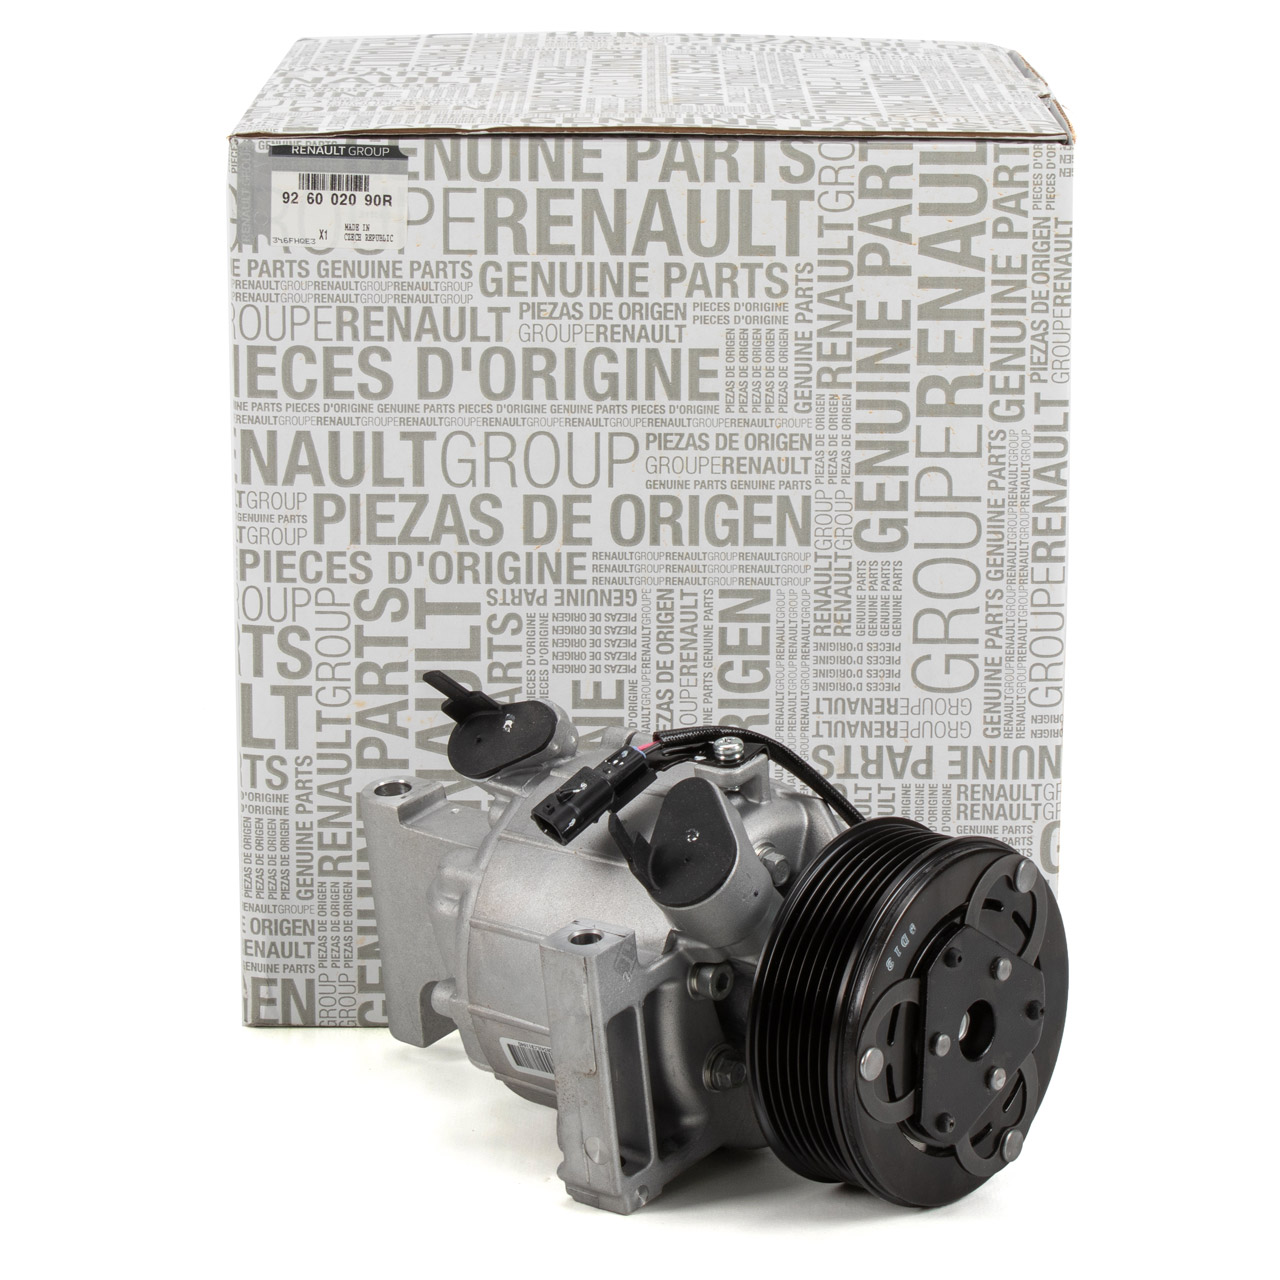 ORIGINAL Renault Kompressor Klimaanlage Twingo 3 0.9 TCe 1.0 SCe 926002090R